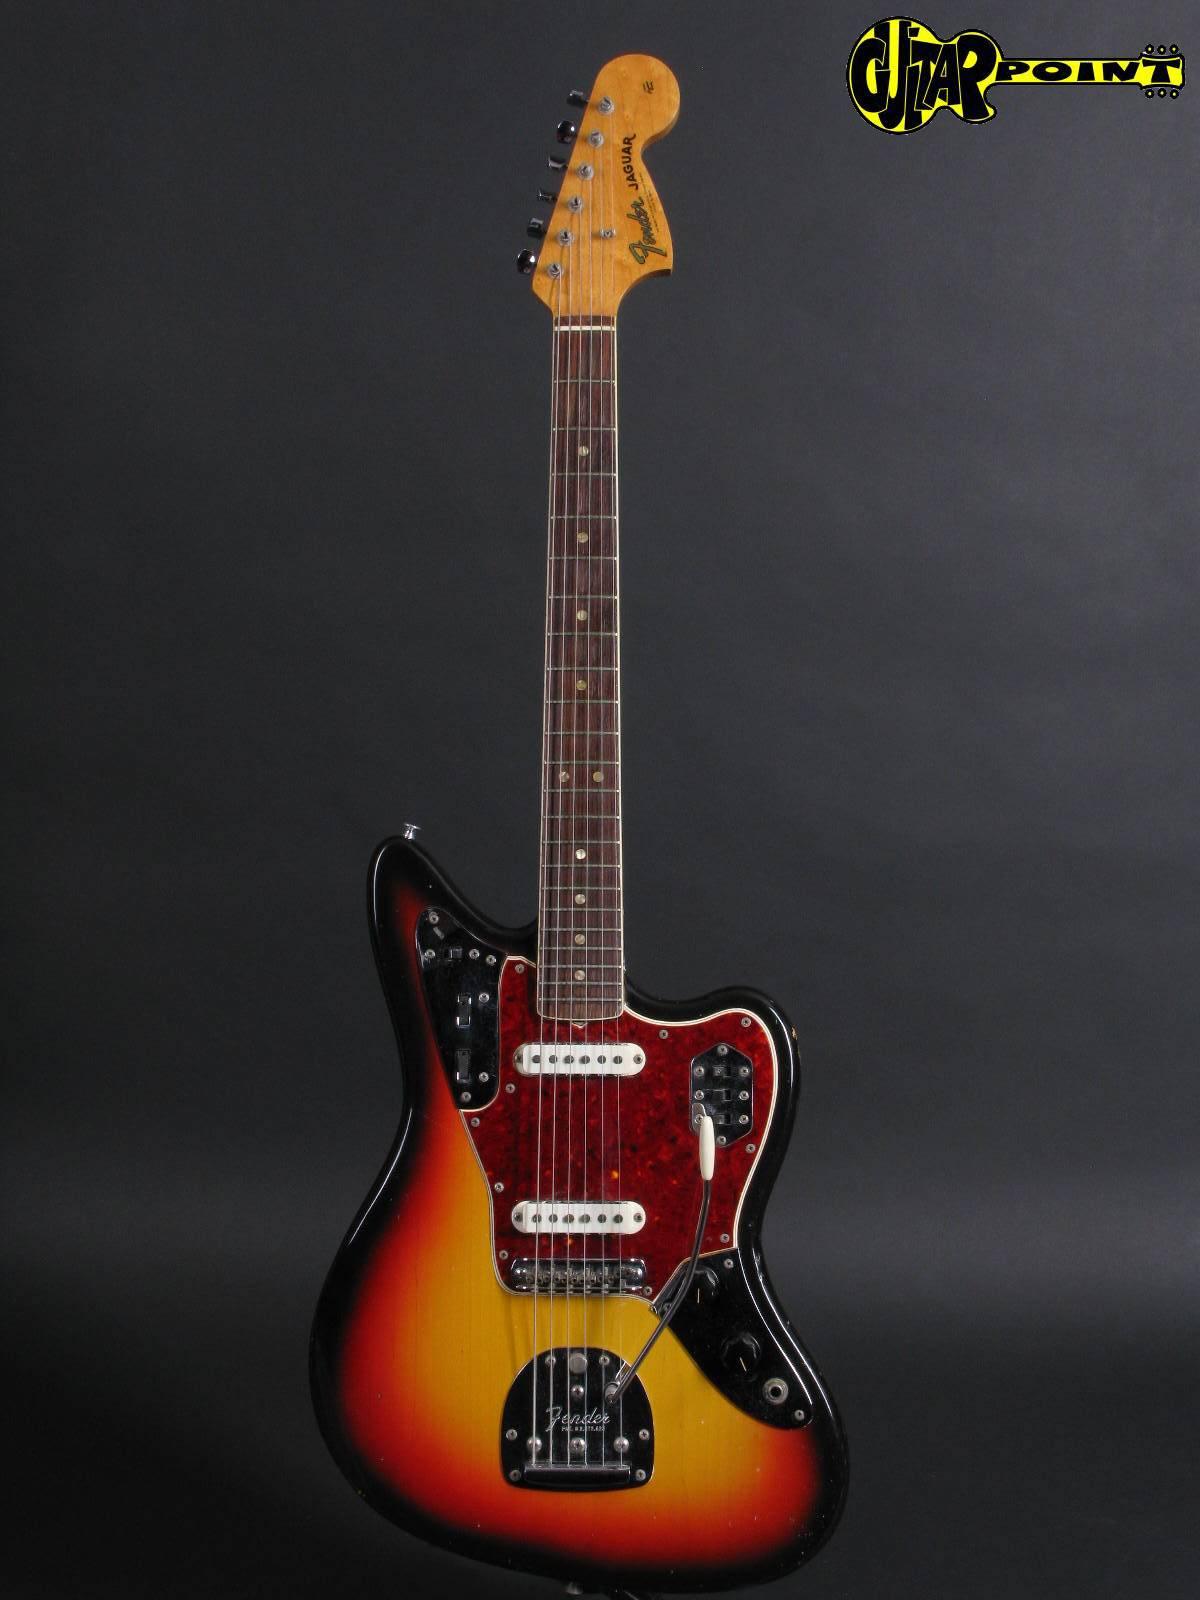 https://guitarpoint.de/app/uploads/products/1966-fender-jaguar-3-tone-sunburst/Fender66Jag_SB_1.jpg